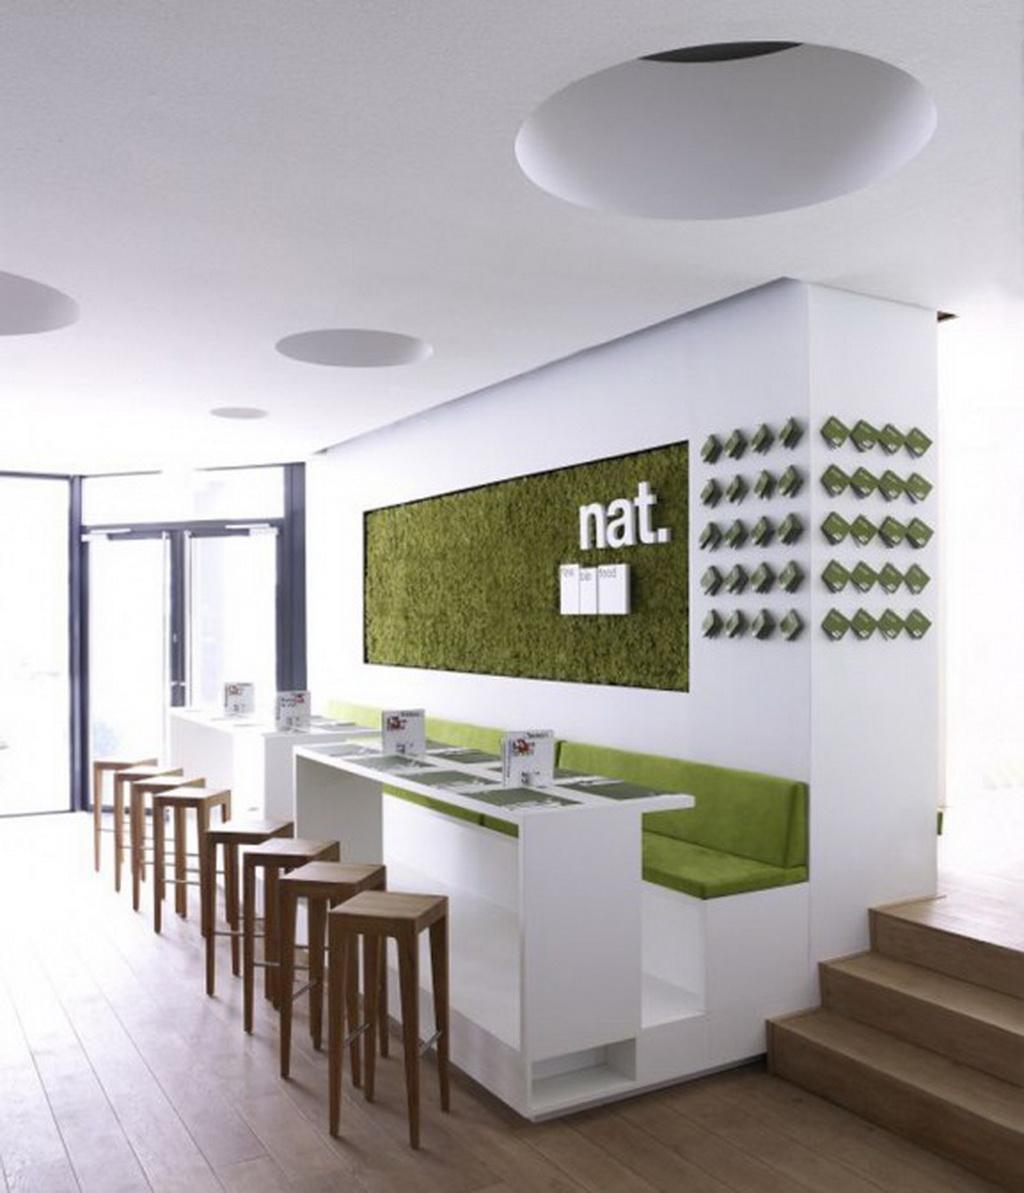 Best-Nature-Design-Concept-Lifestyle-Interior-Restaurant-Decorating-Ideas-1 3 Ideas Will Make Your Restaurant Interior Design Looks The Best